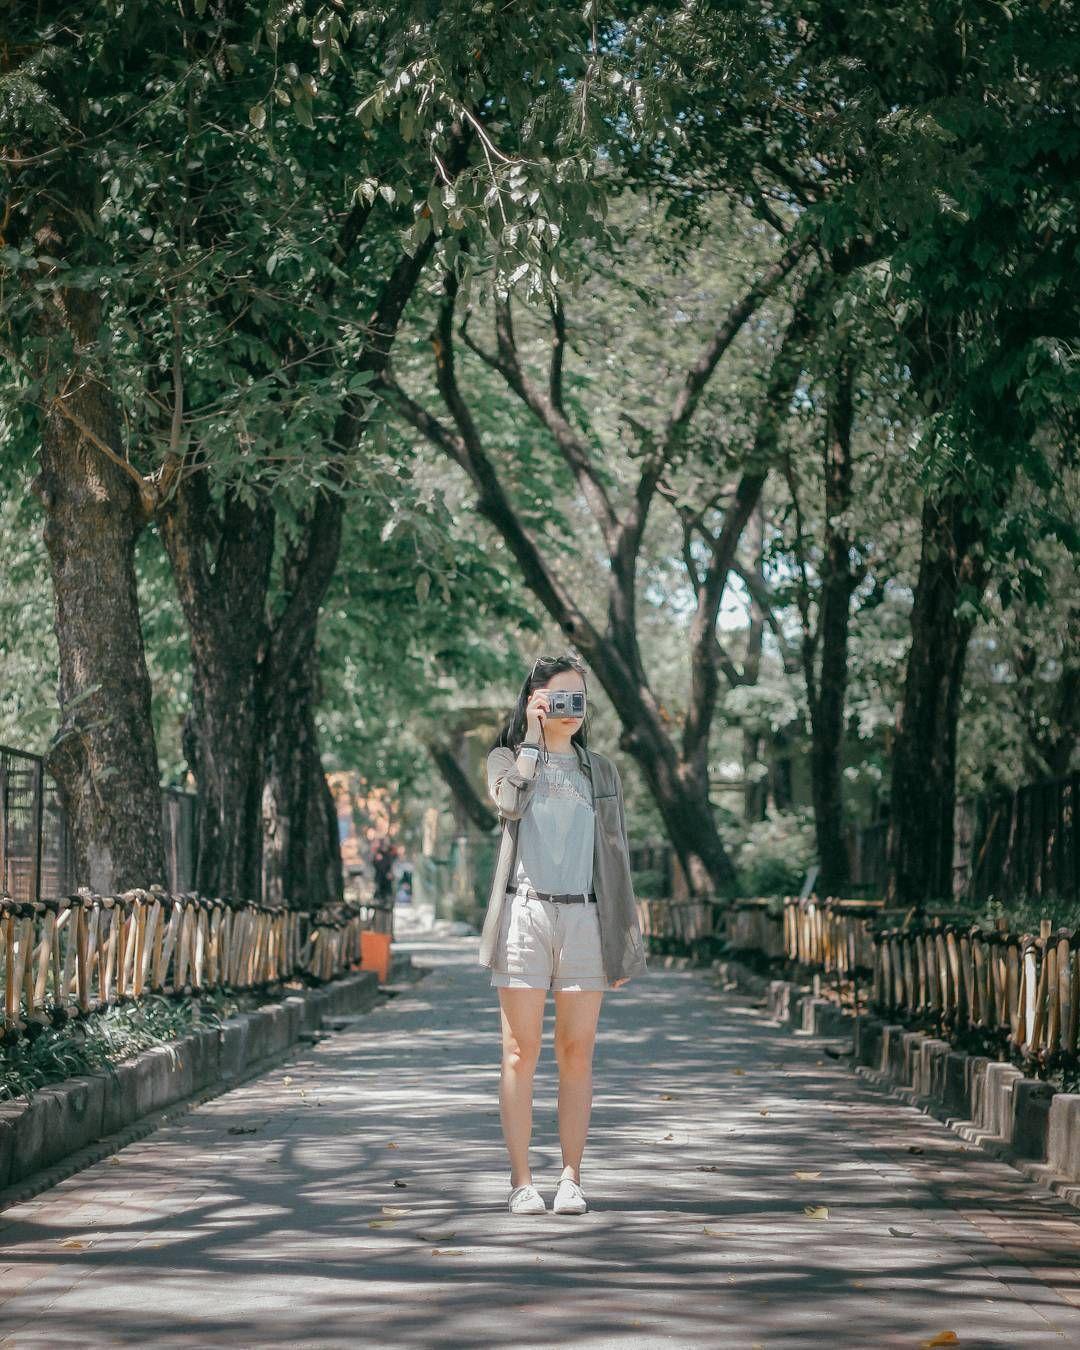 Daftar Online Kebun Binatang Surabaya